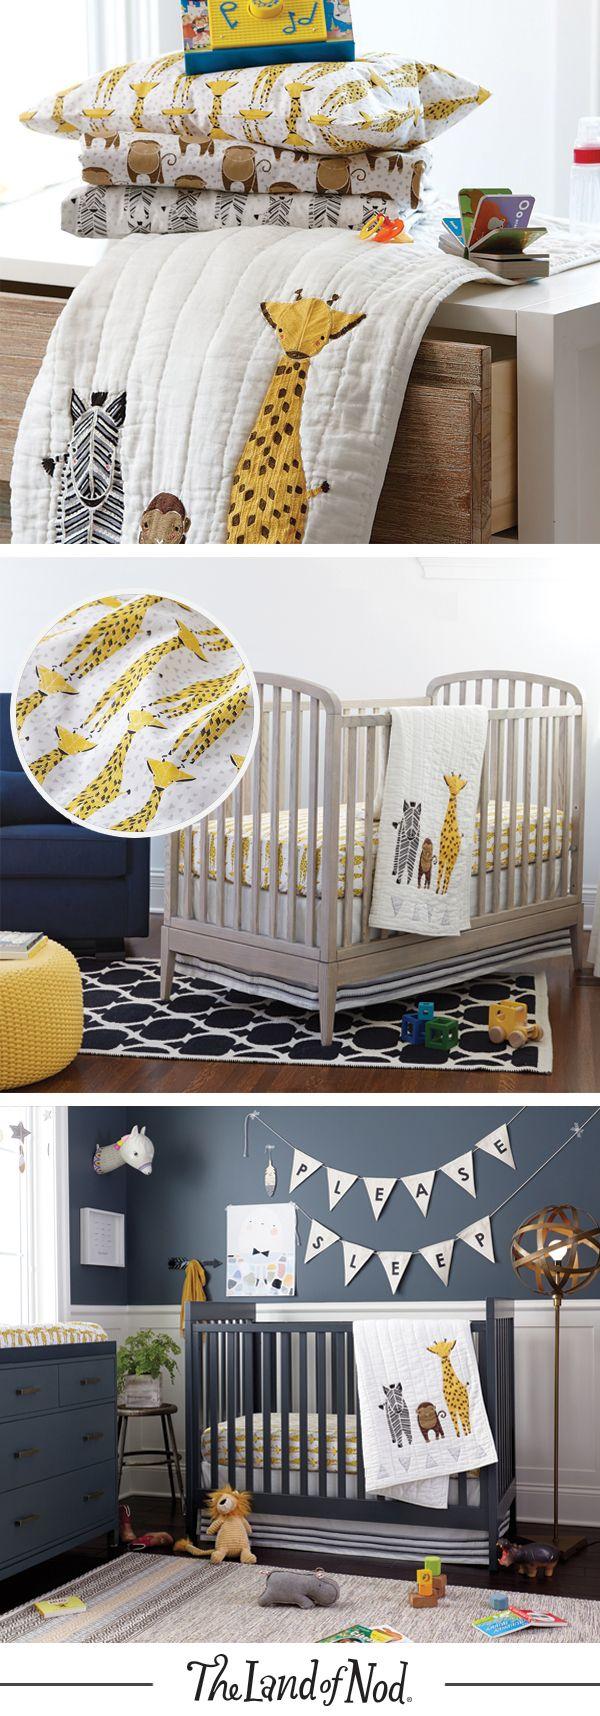 a giraffe themed nursery be a tall order thatu0027s why we plenty